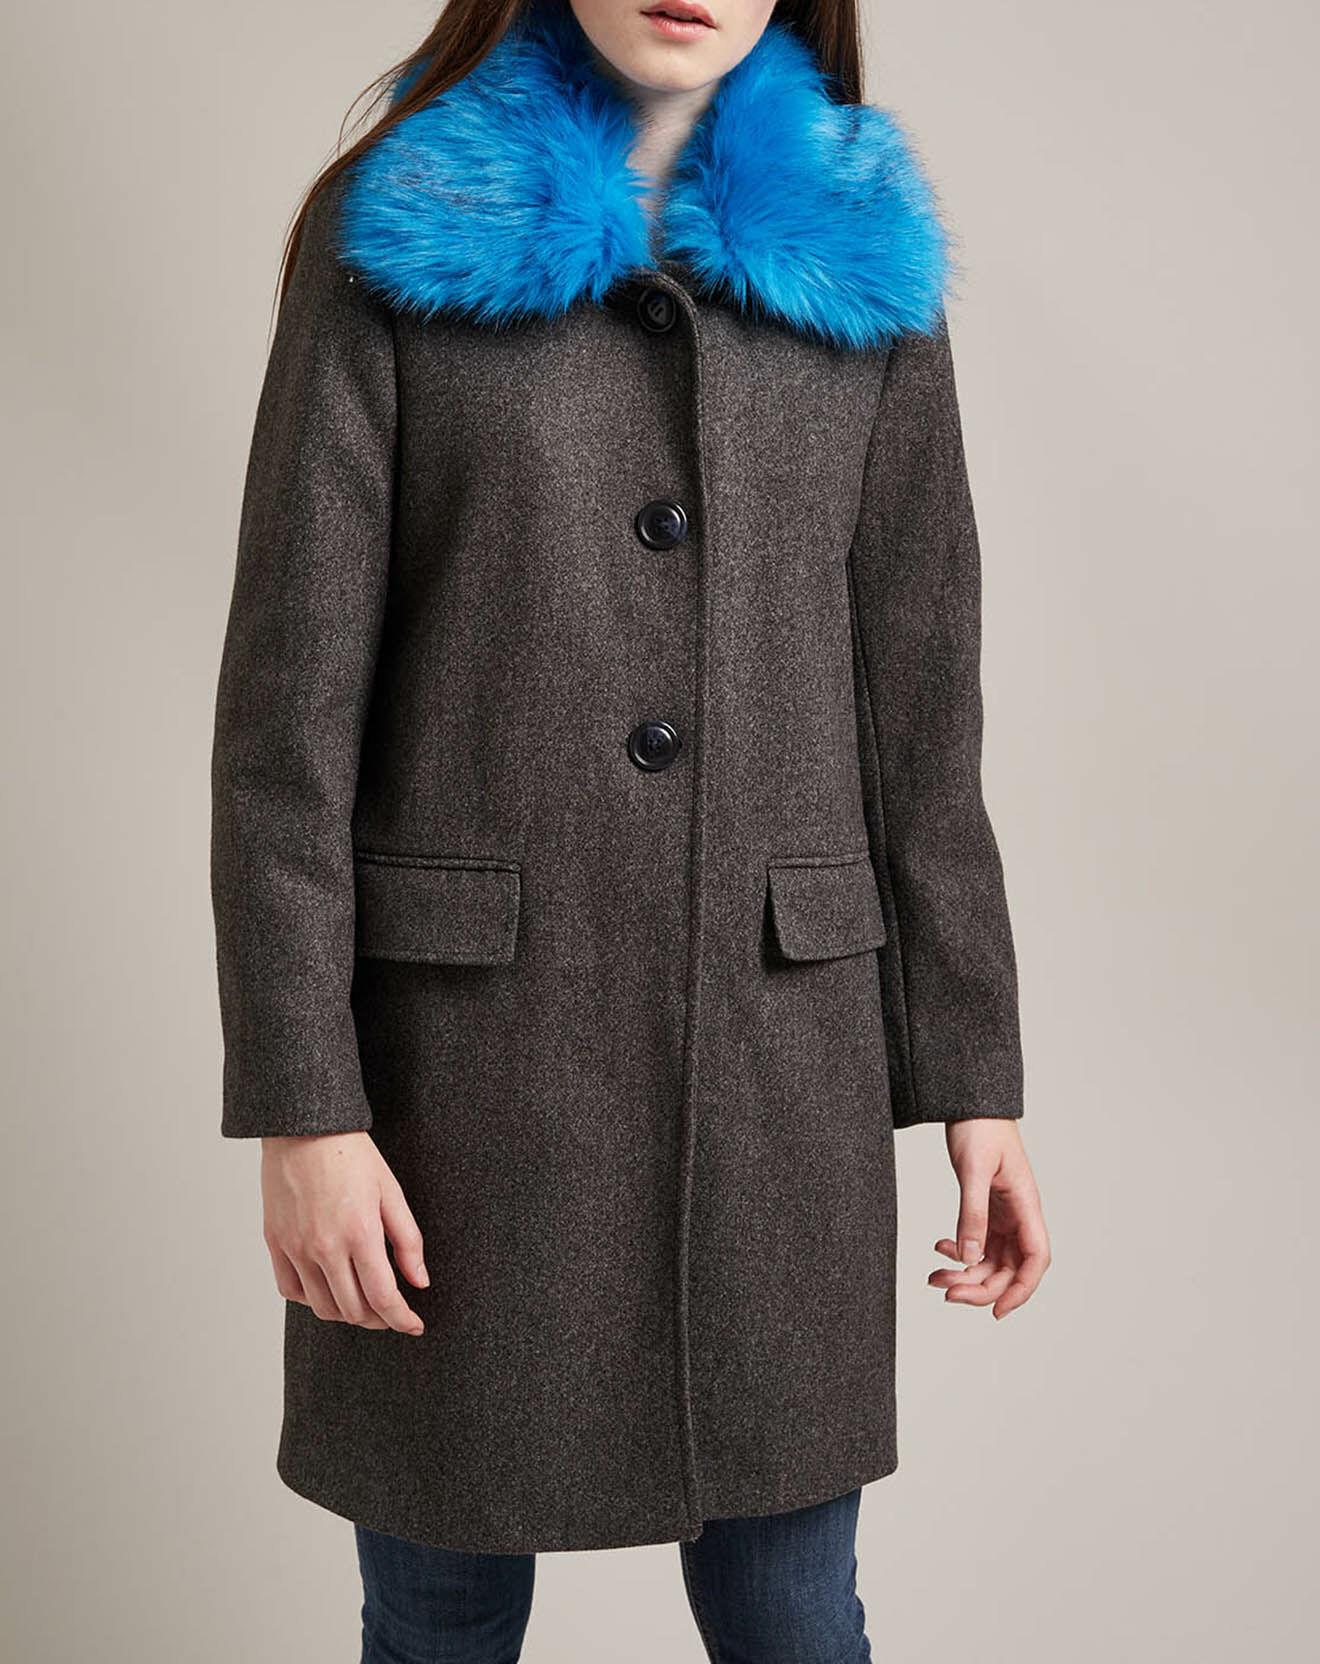 Manteau long Balzane col fantaisie contrastant - Derhy - Modalova